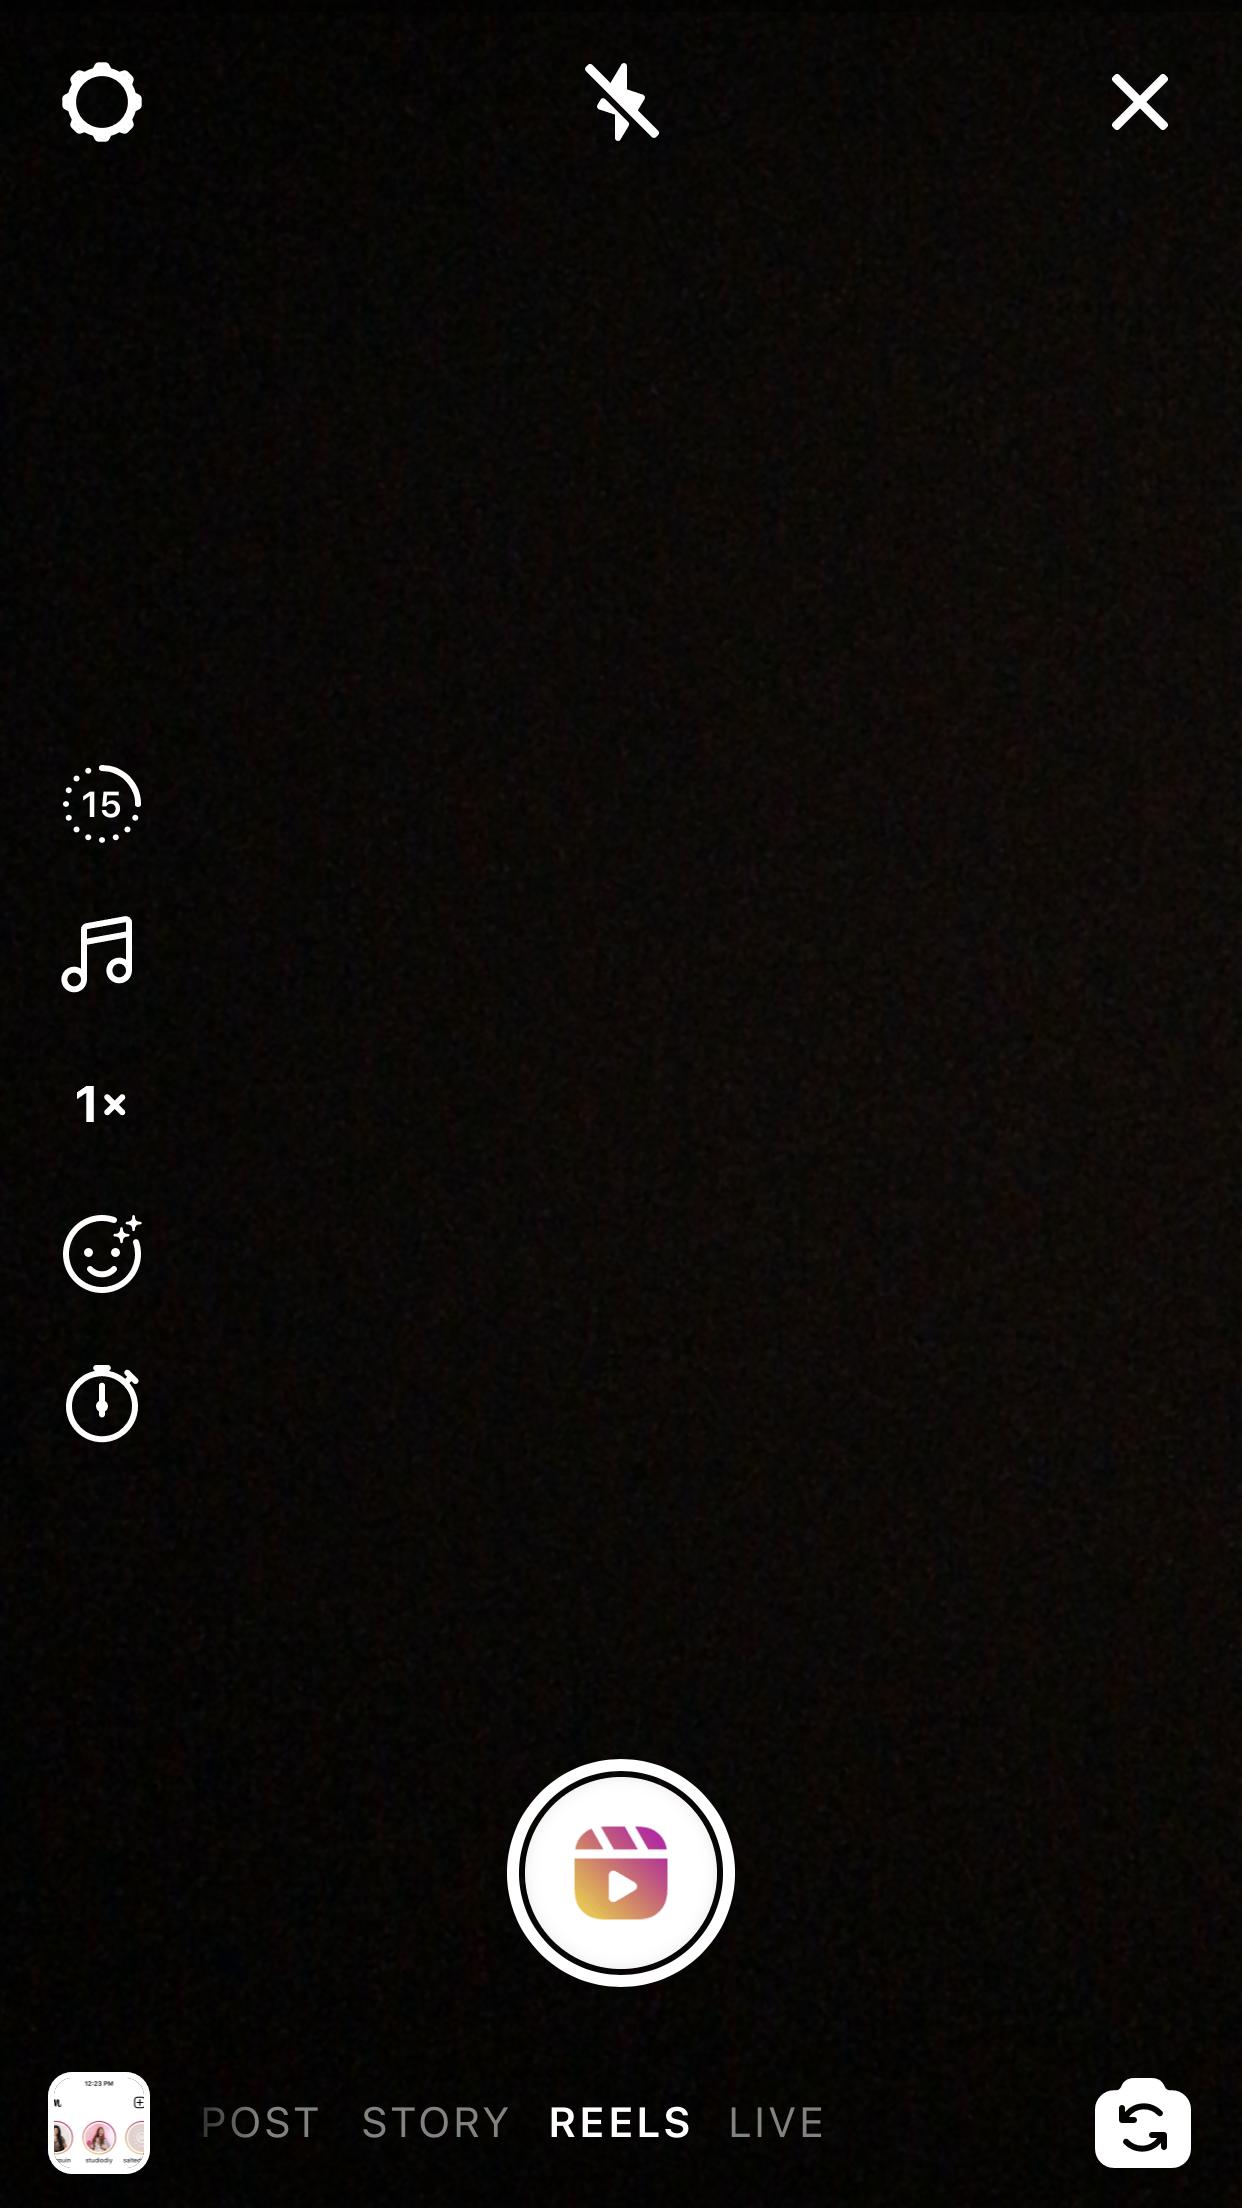 A screenshot of the Reels creation tab in Instagram.